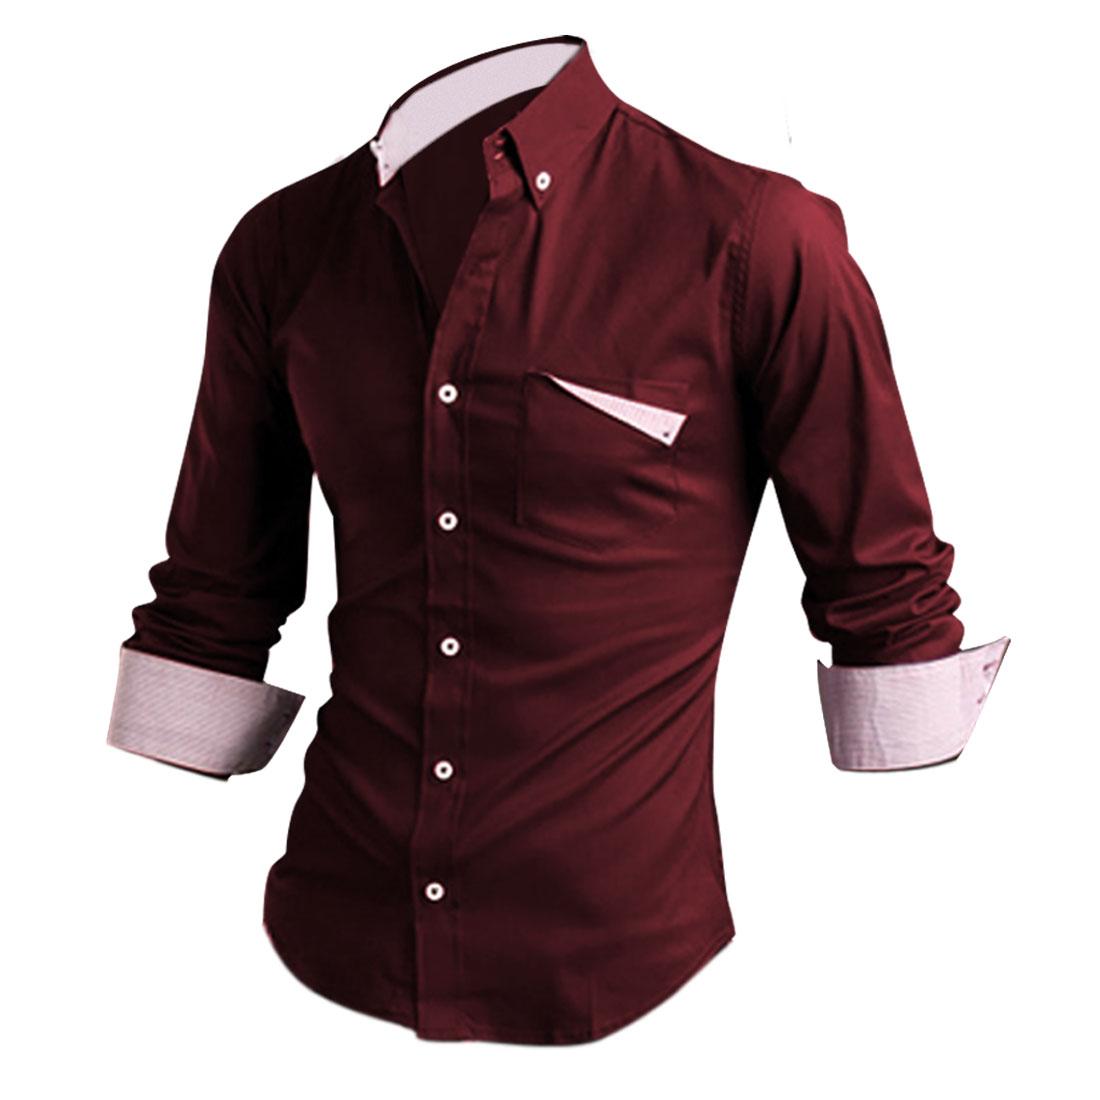 Men Single Breasted Winter Wearing NEWS Shirt Burgundy M